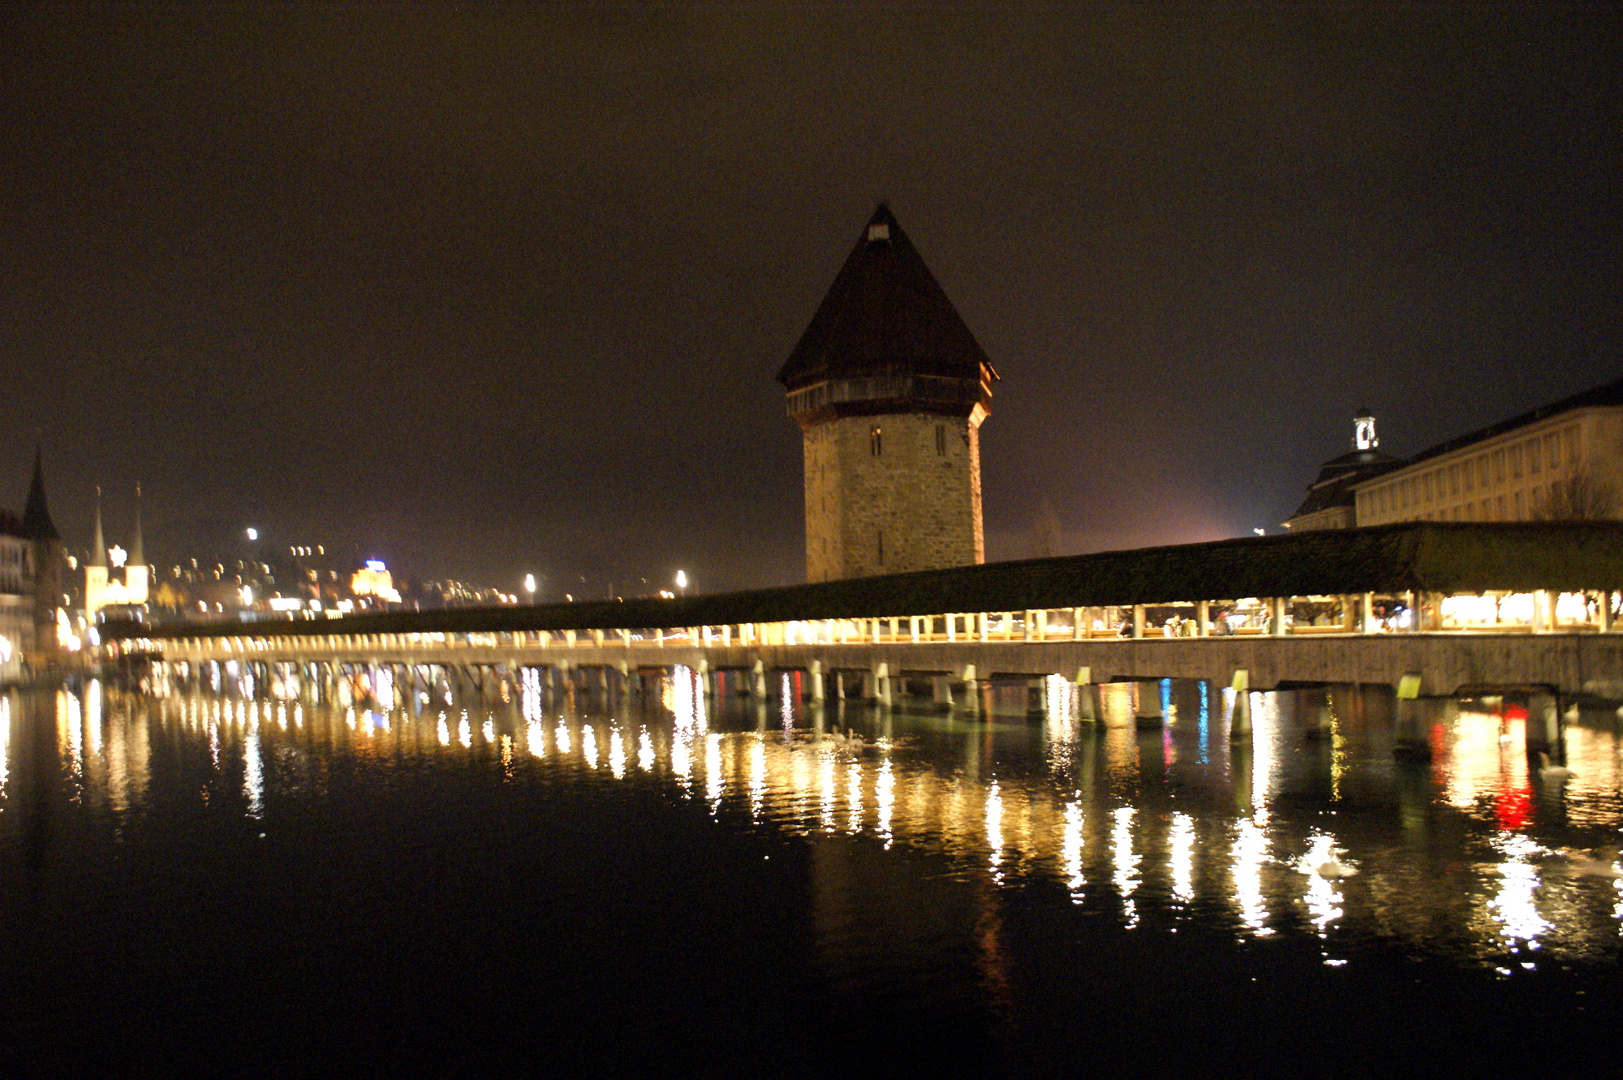 Kapellbrücke Luzern bei Nacht